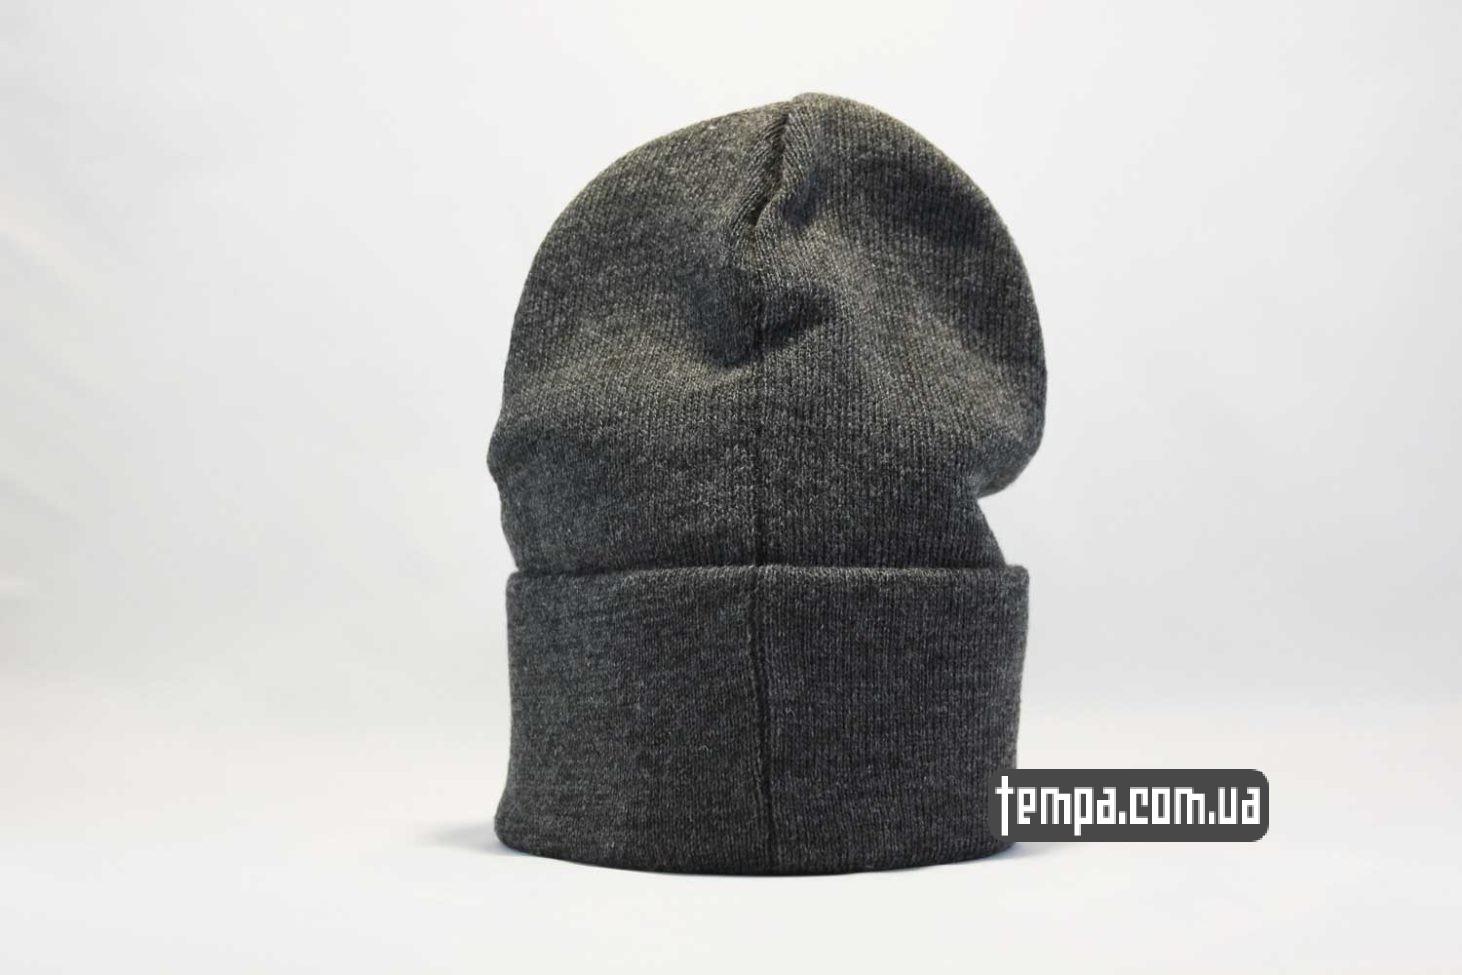 vans магазин шапка beanie VANS OFF THE WALL серая купить